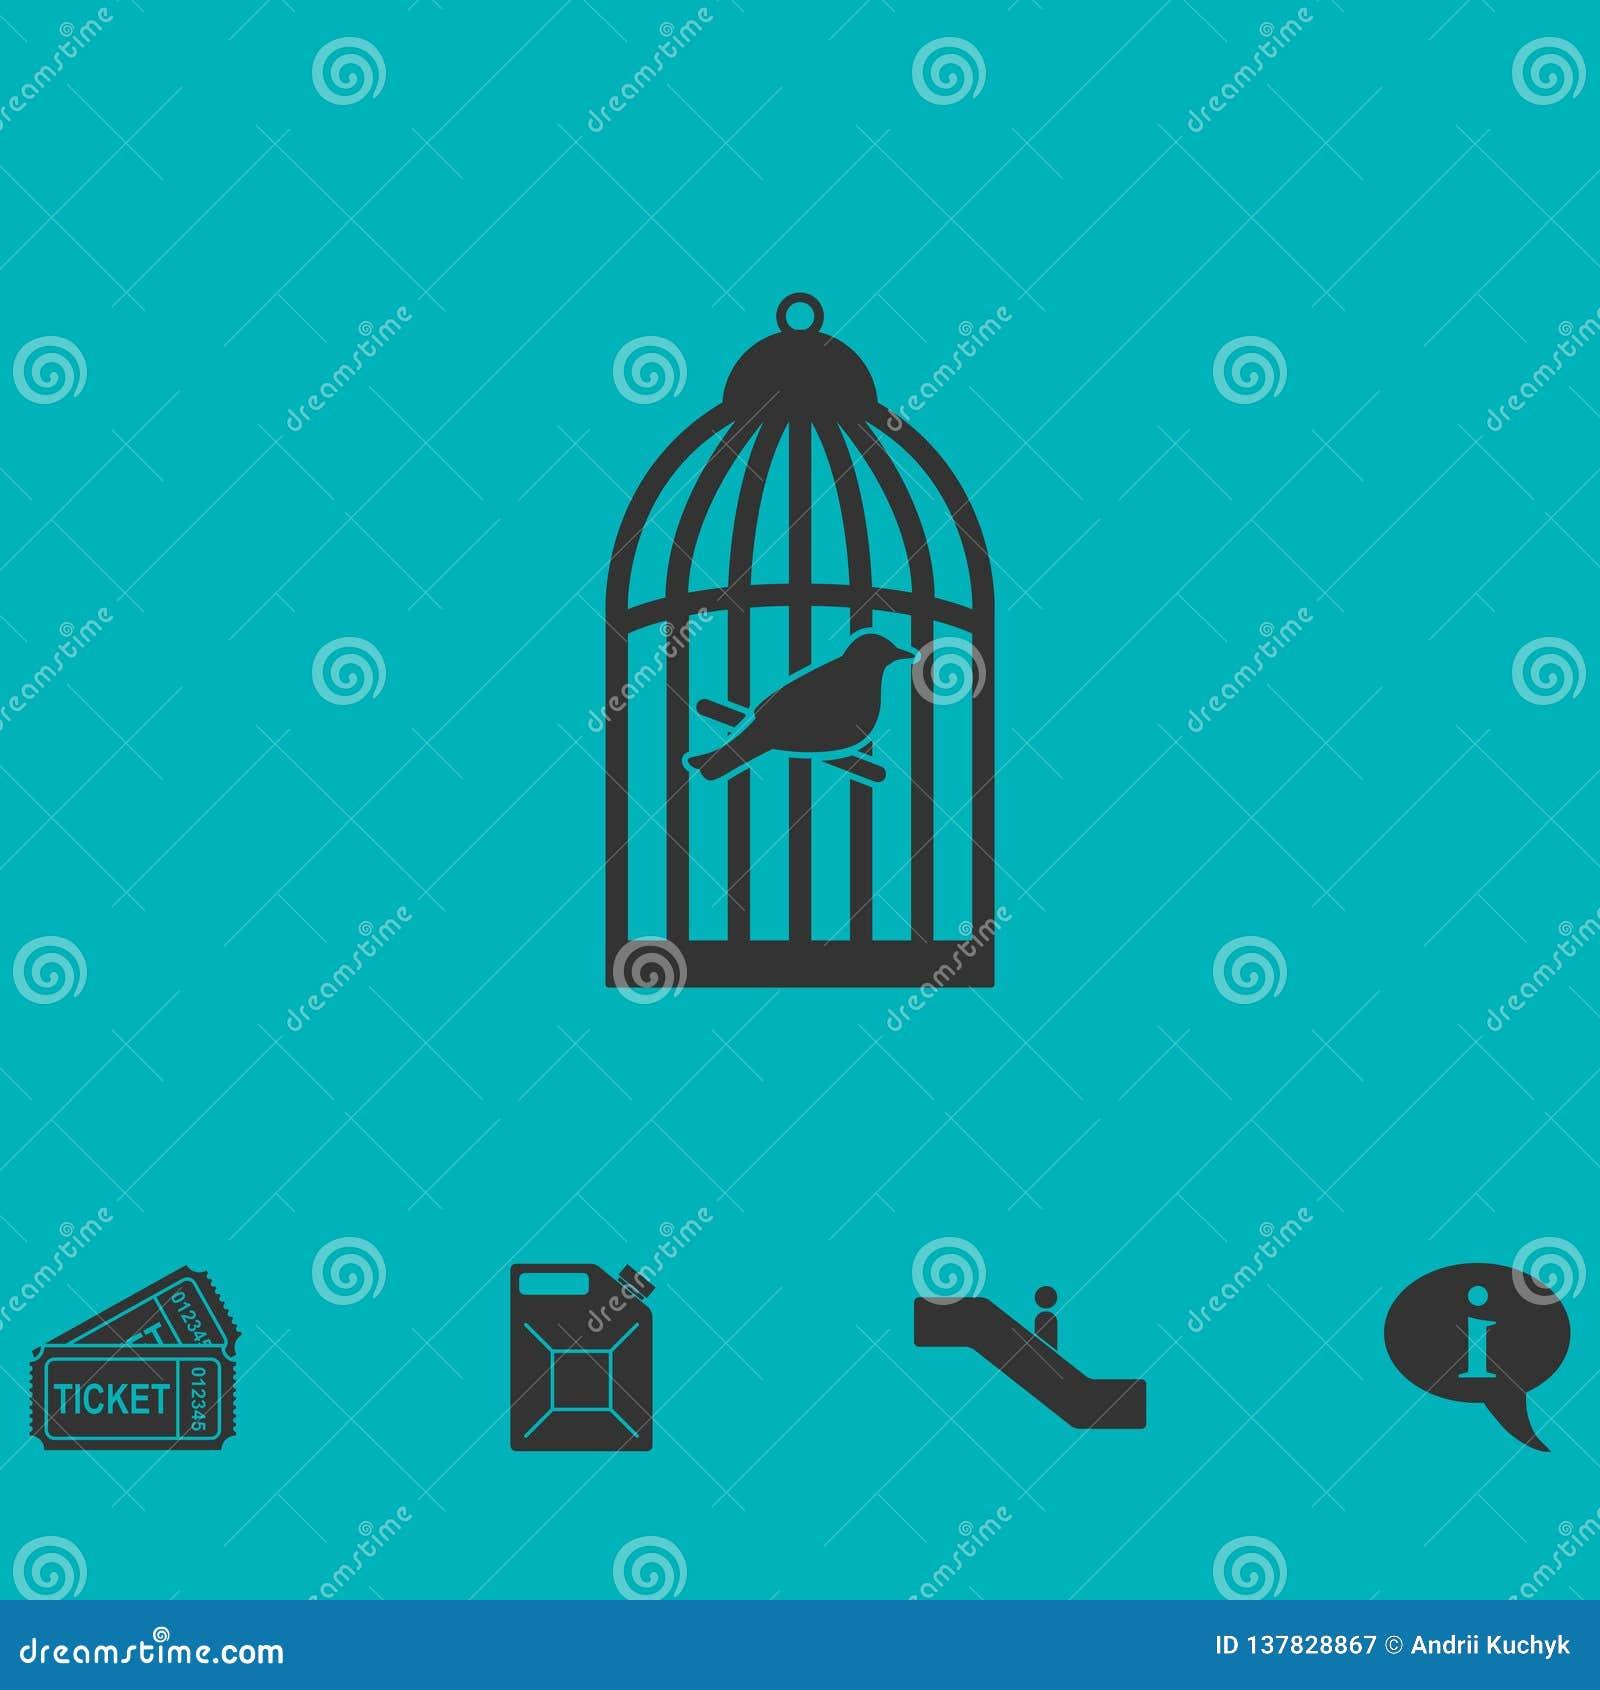 Birdcage icon flat